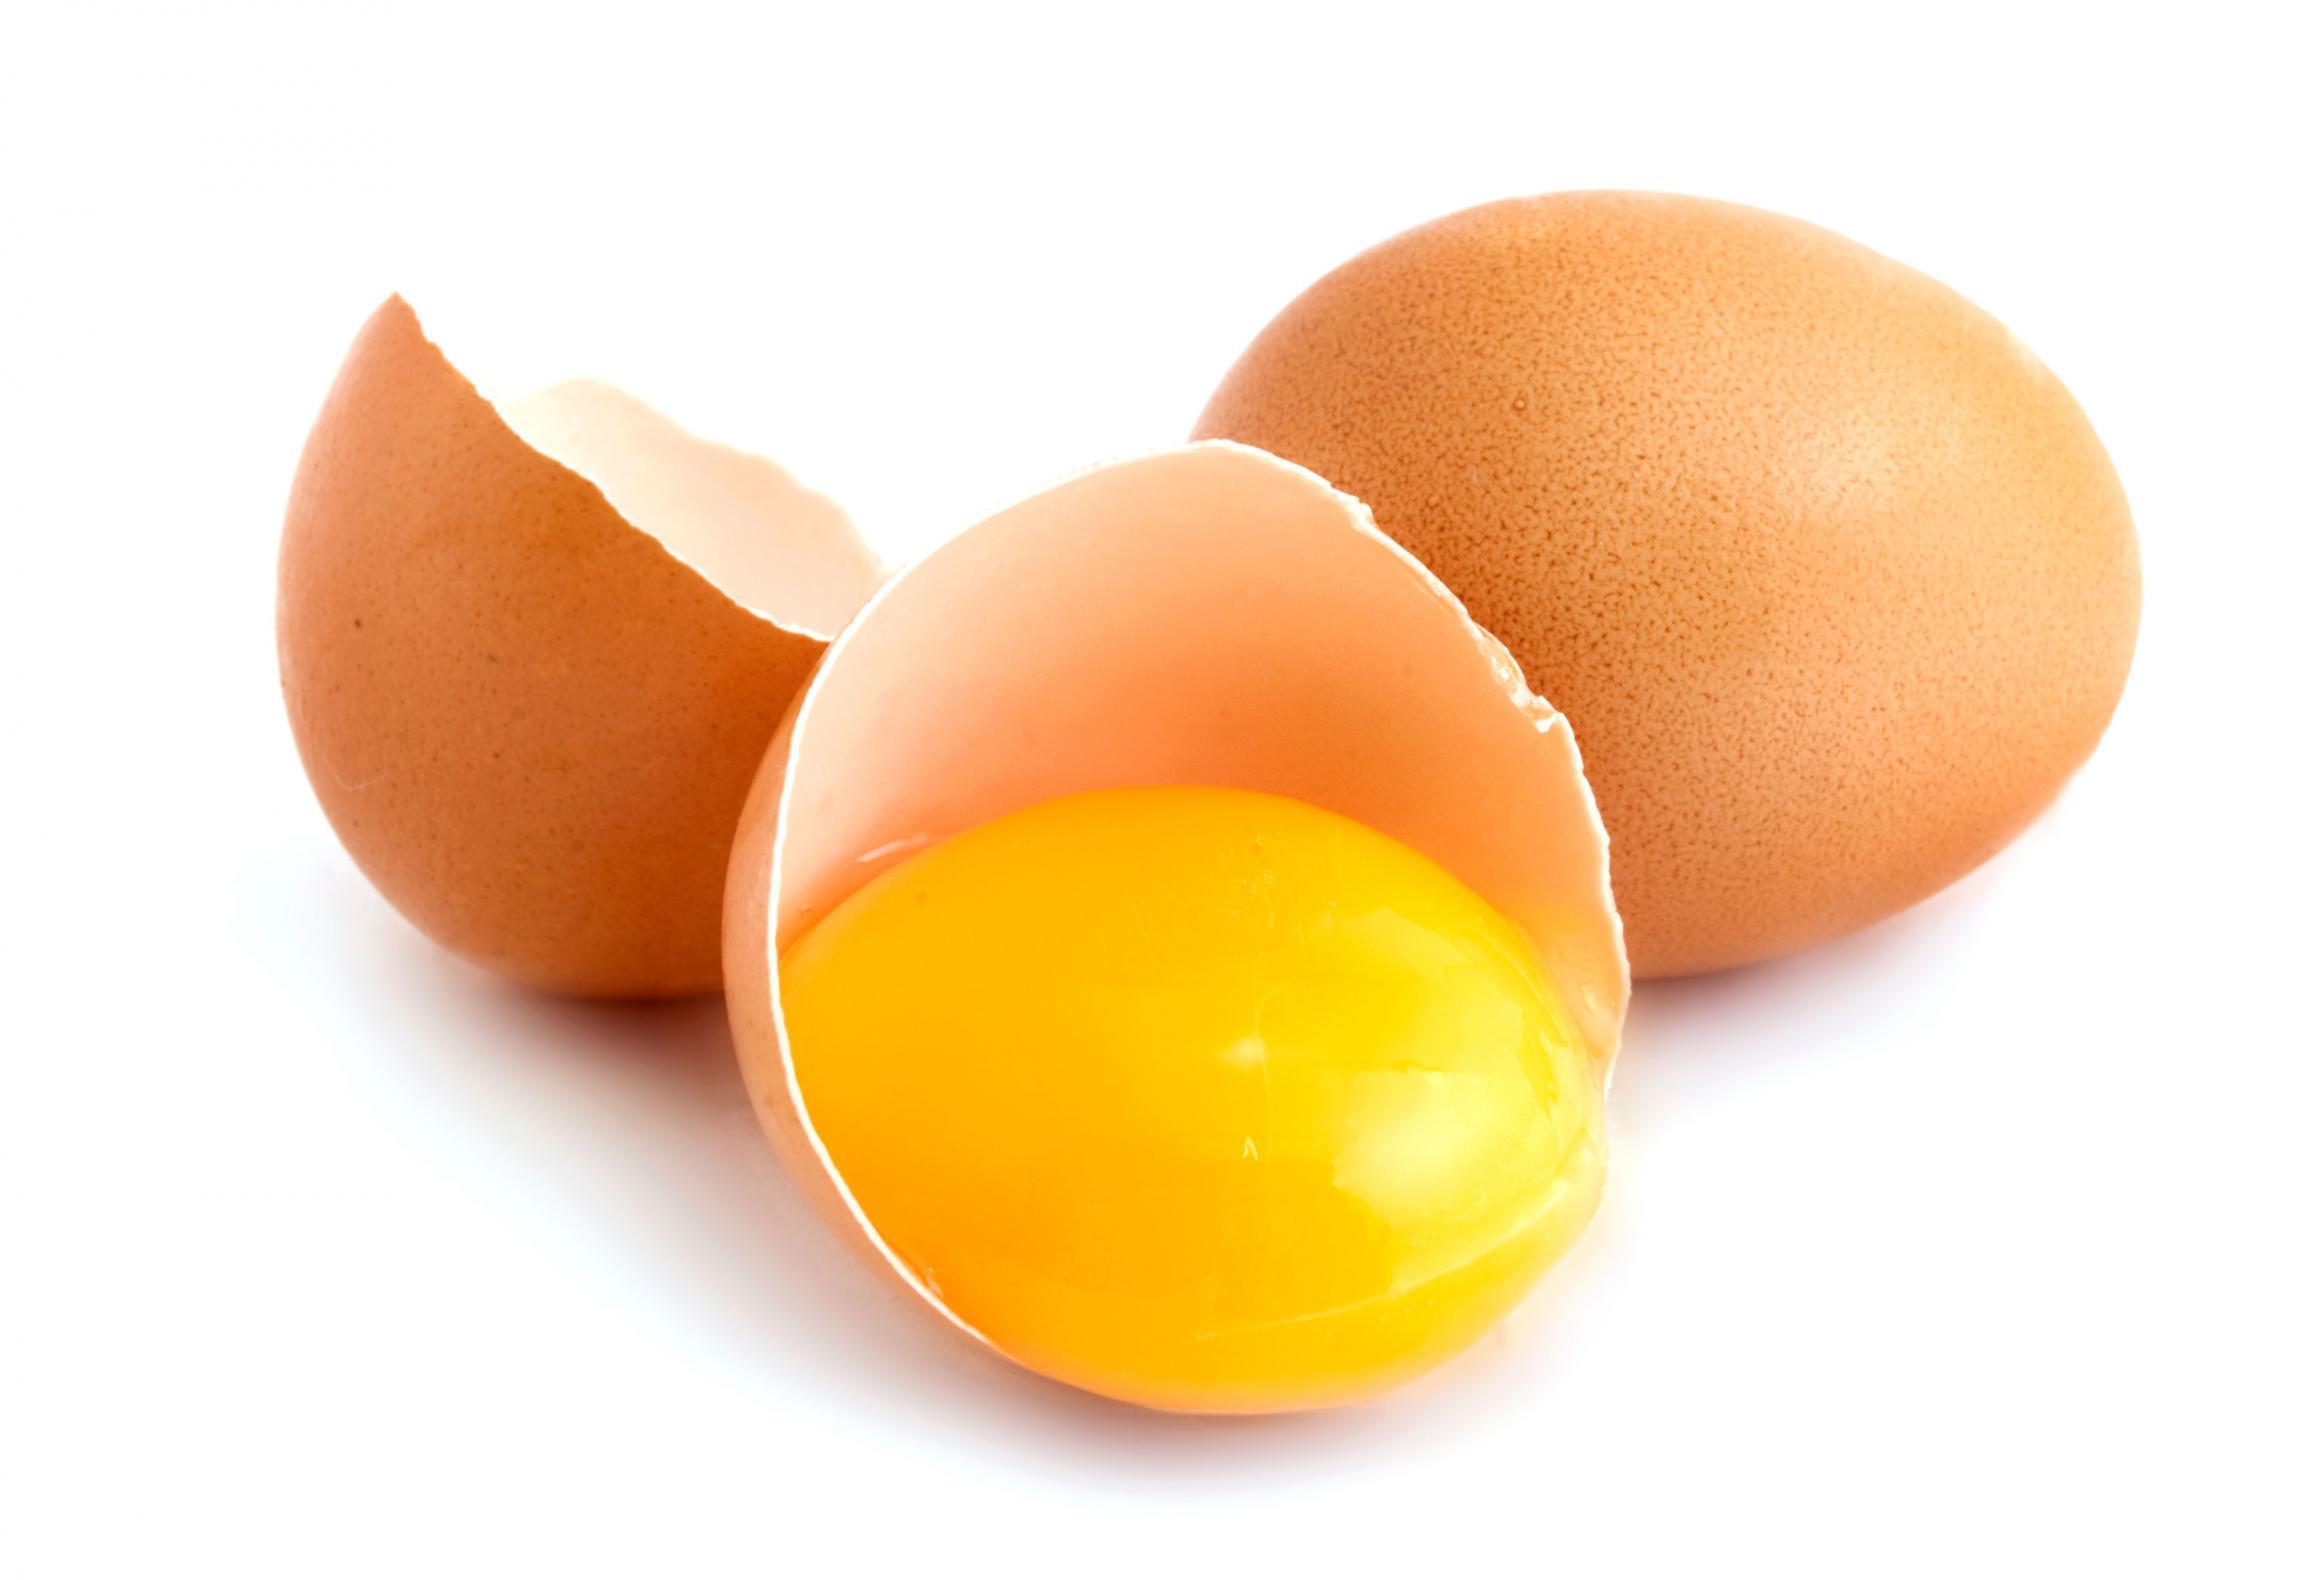 salmonella æg symptomer